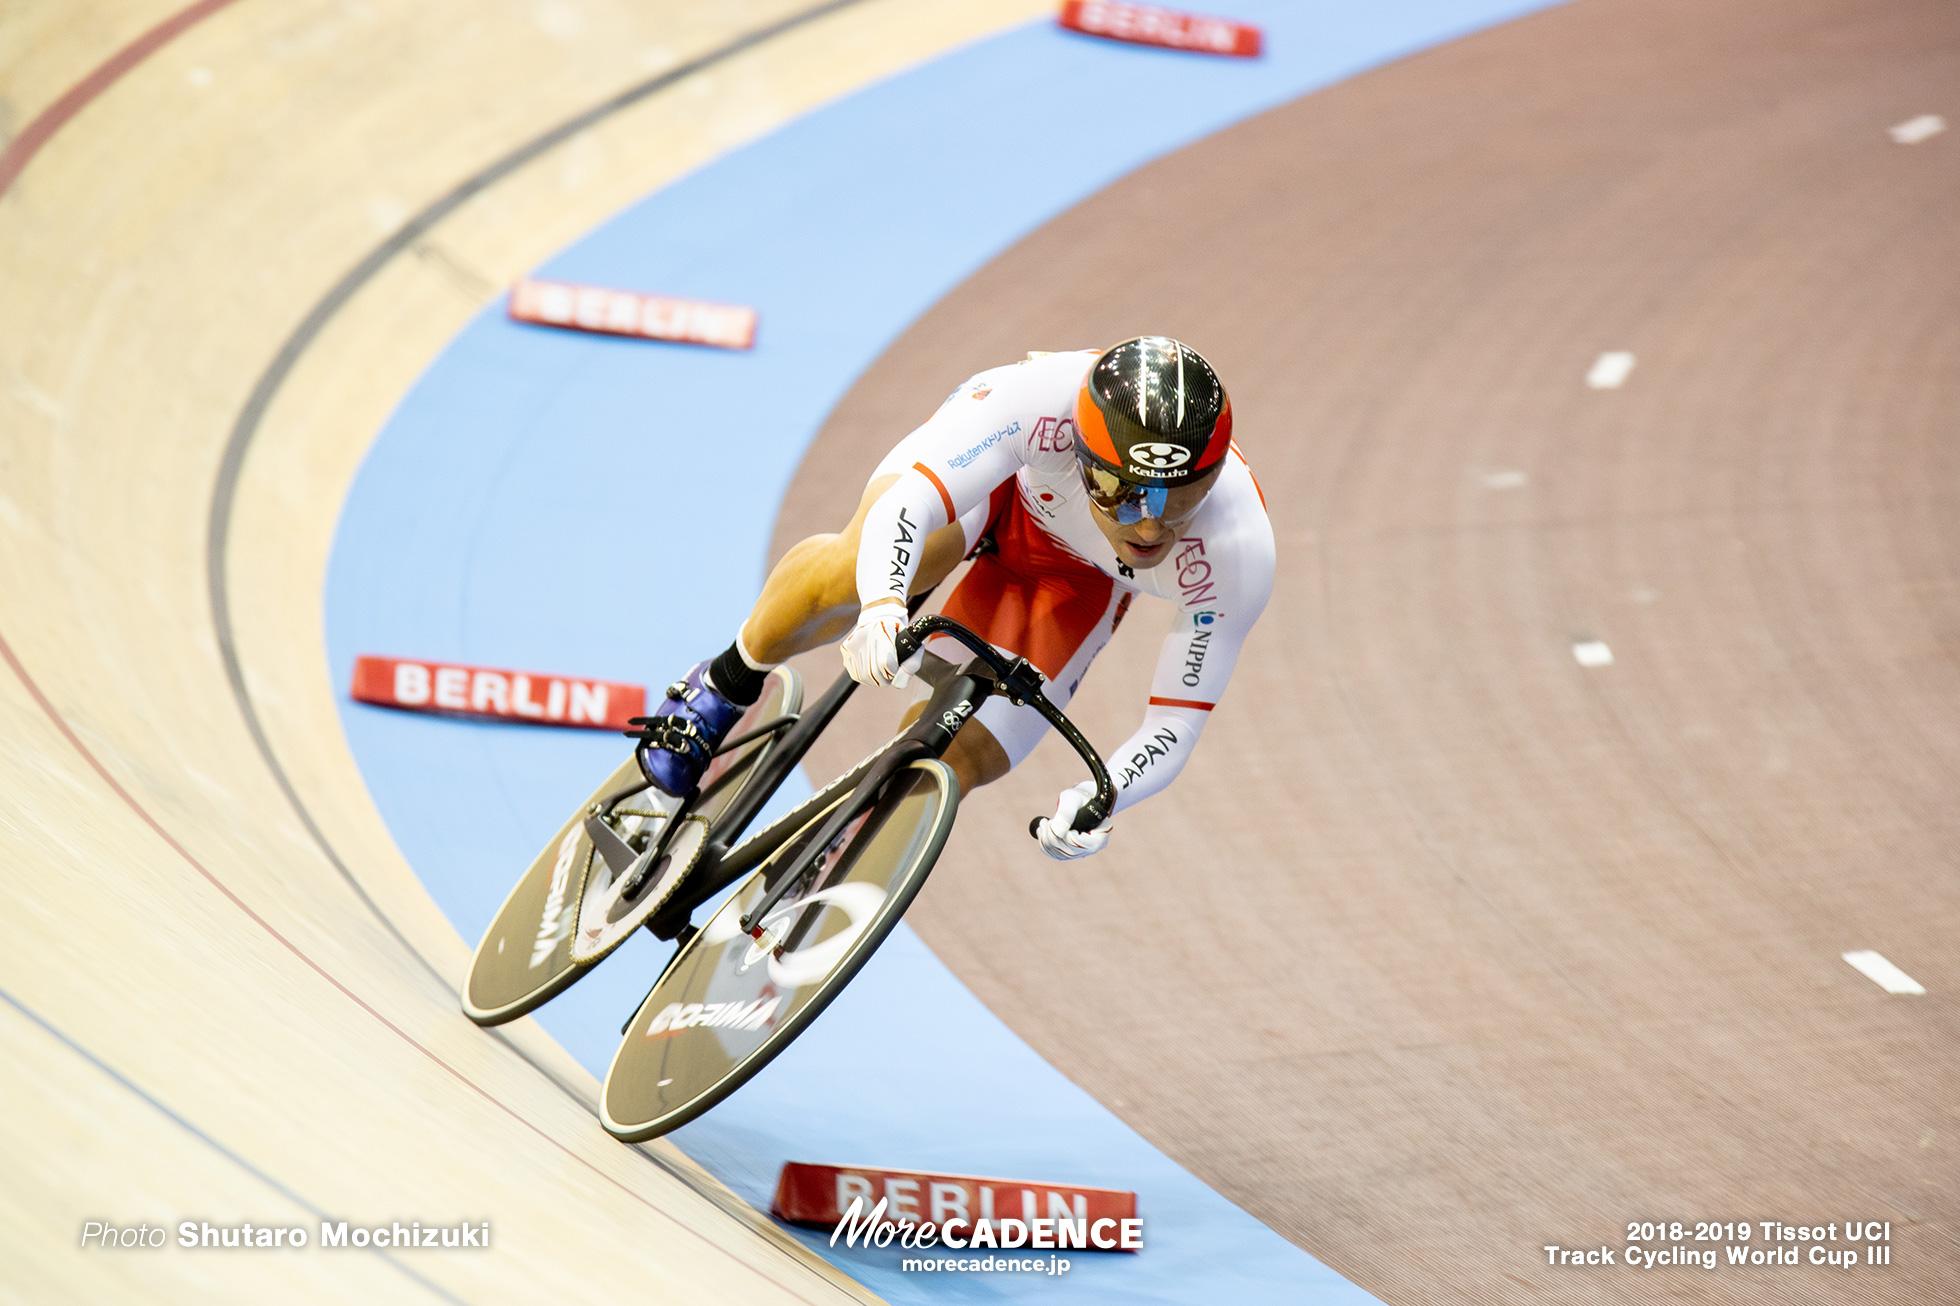 Men's Sprint/2018-2019 Track Cycling World Cup III Berlin